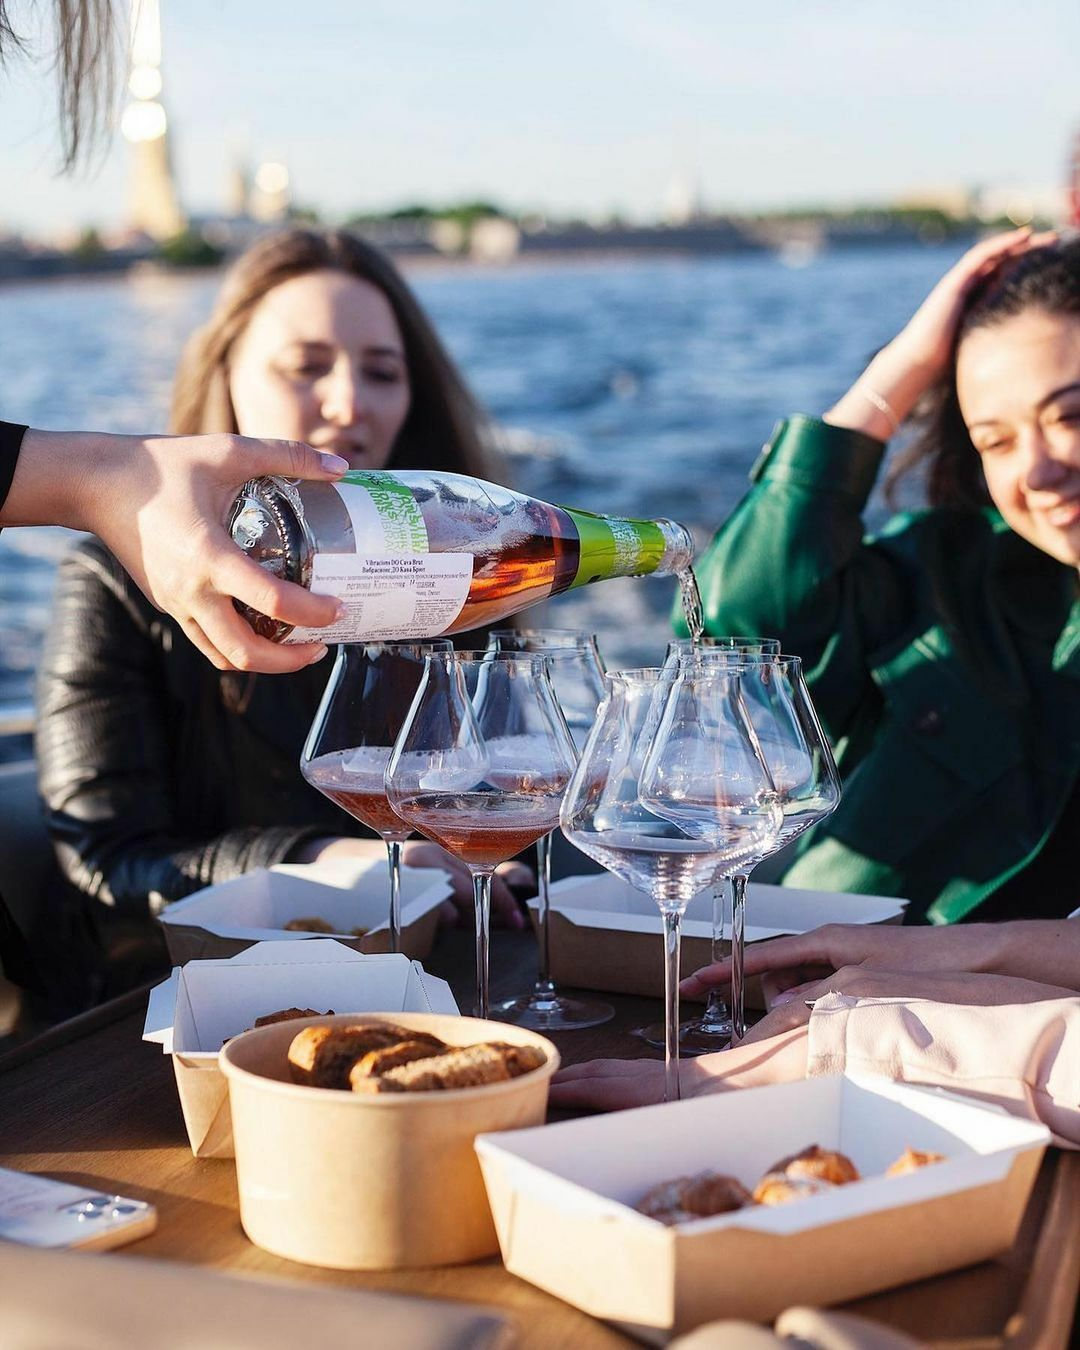 Boat Trip ресторана Charlie, Санкт-Петербург